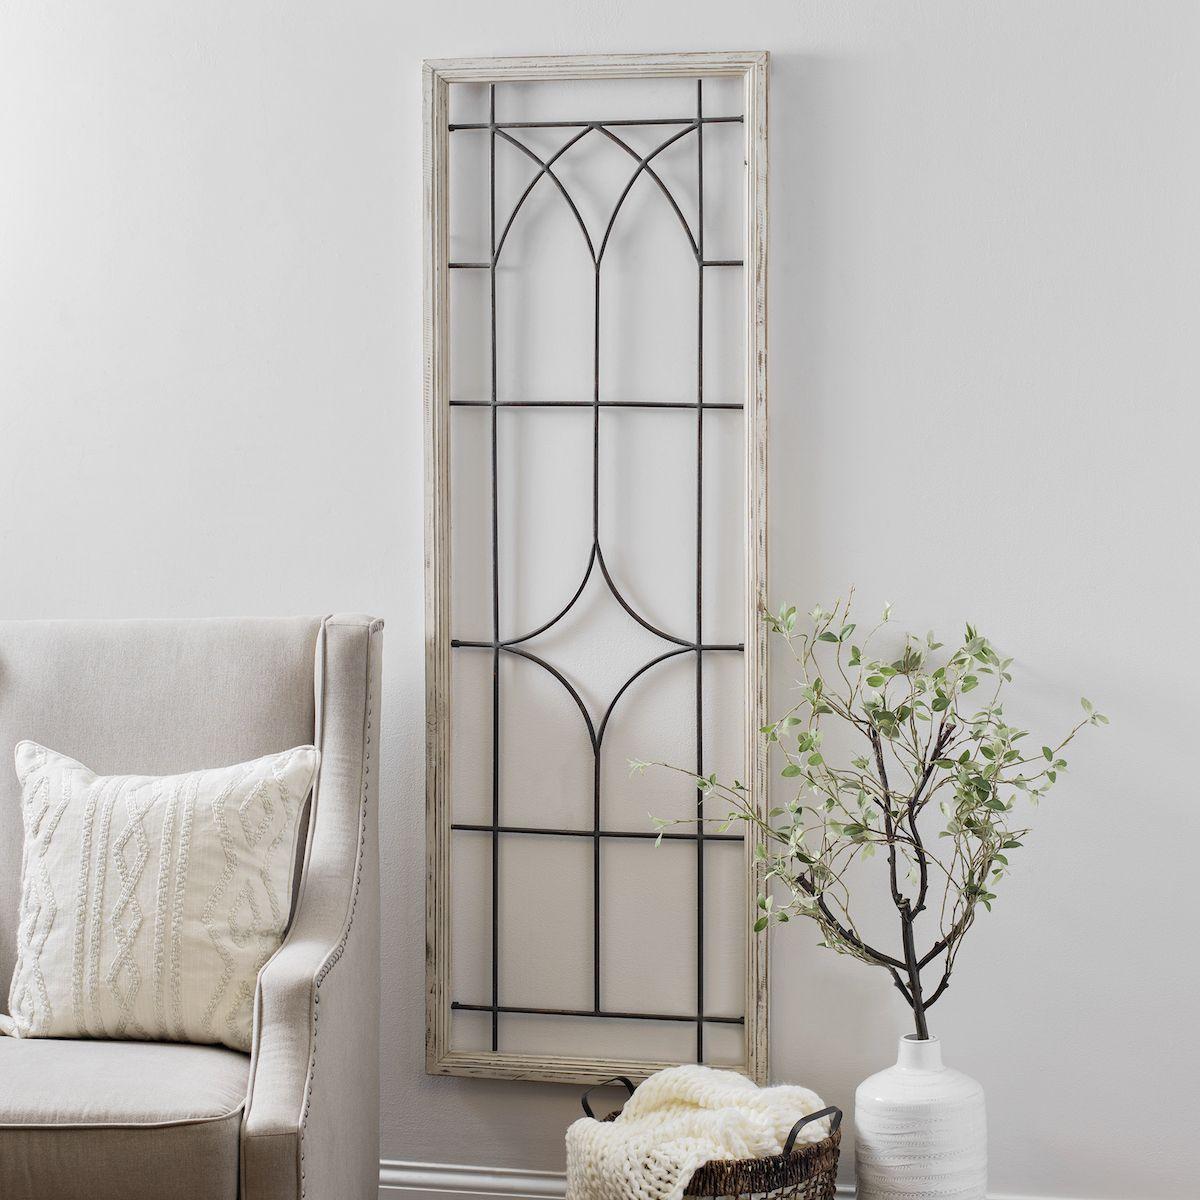 Window Wood And Metal Panel Wall Plaque